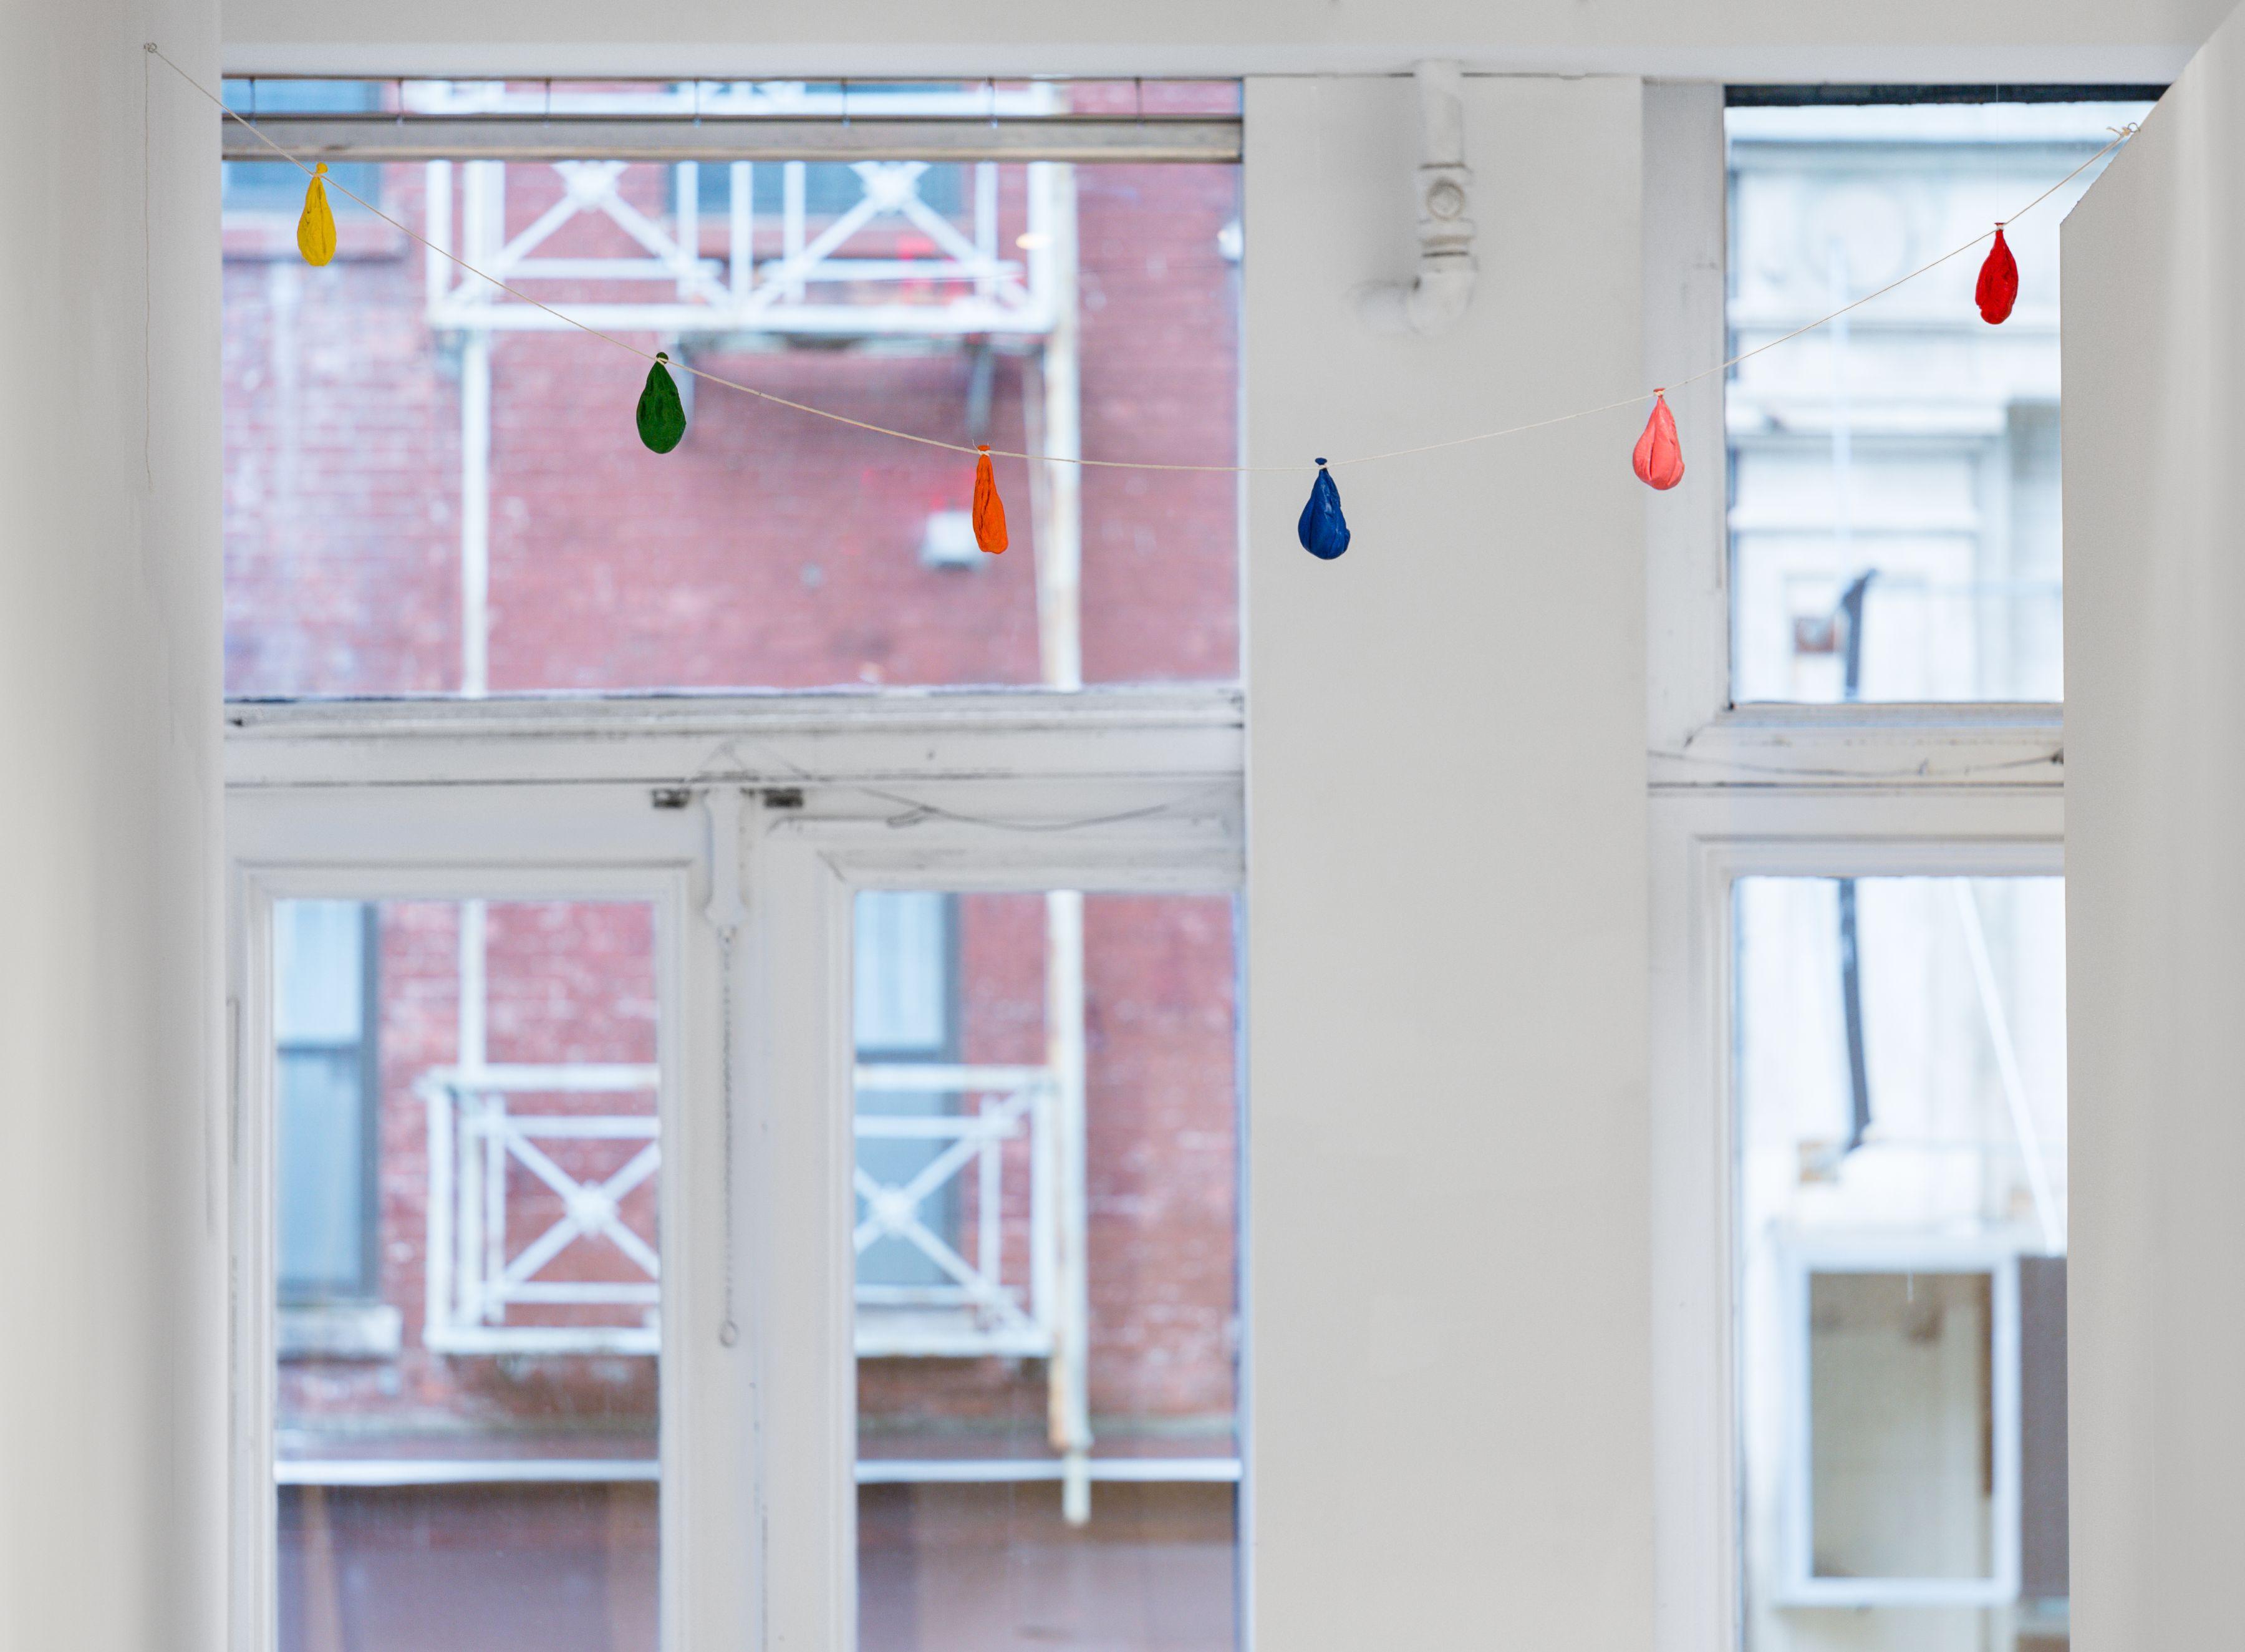 David Adamo Untitled (balloons)